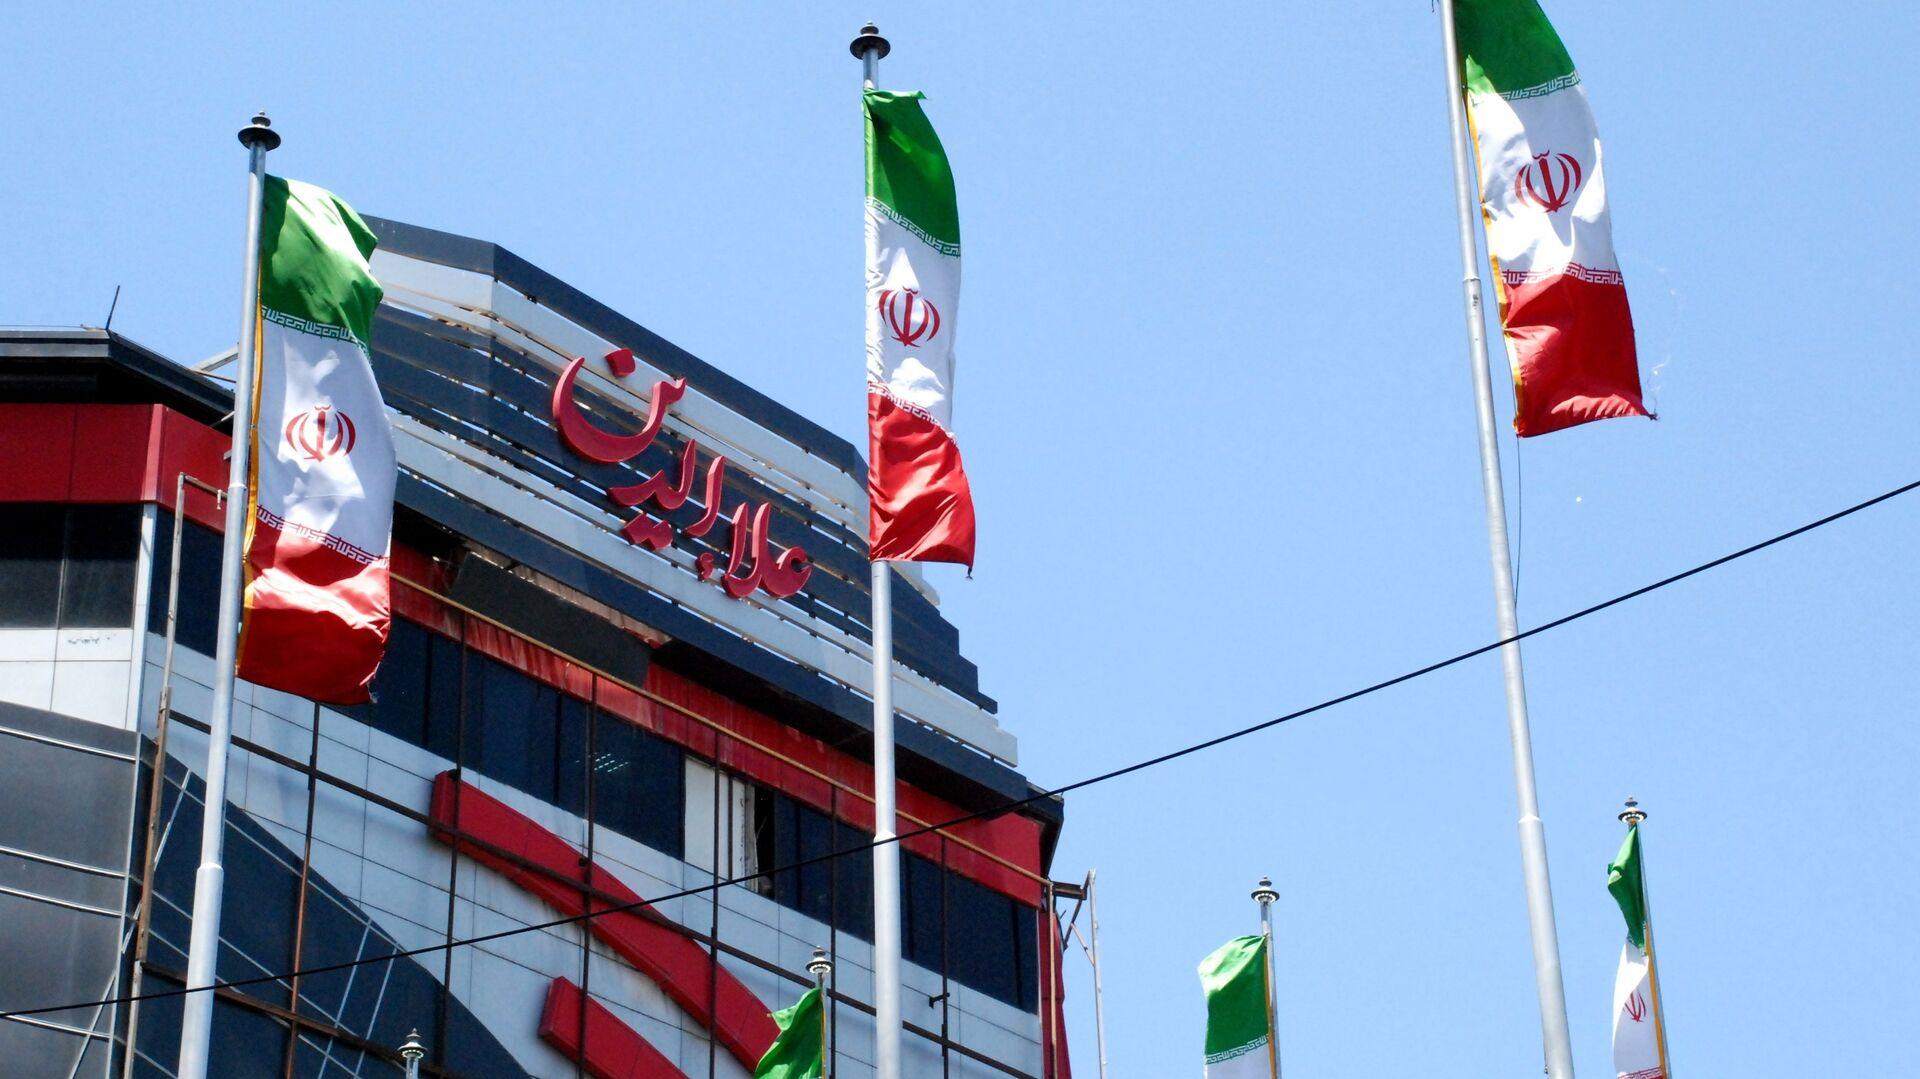 Флаги Ирана на одной из улиц Тегерана - РИА Новости, 1920, 20.09.2020